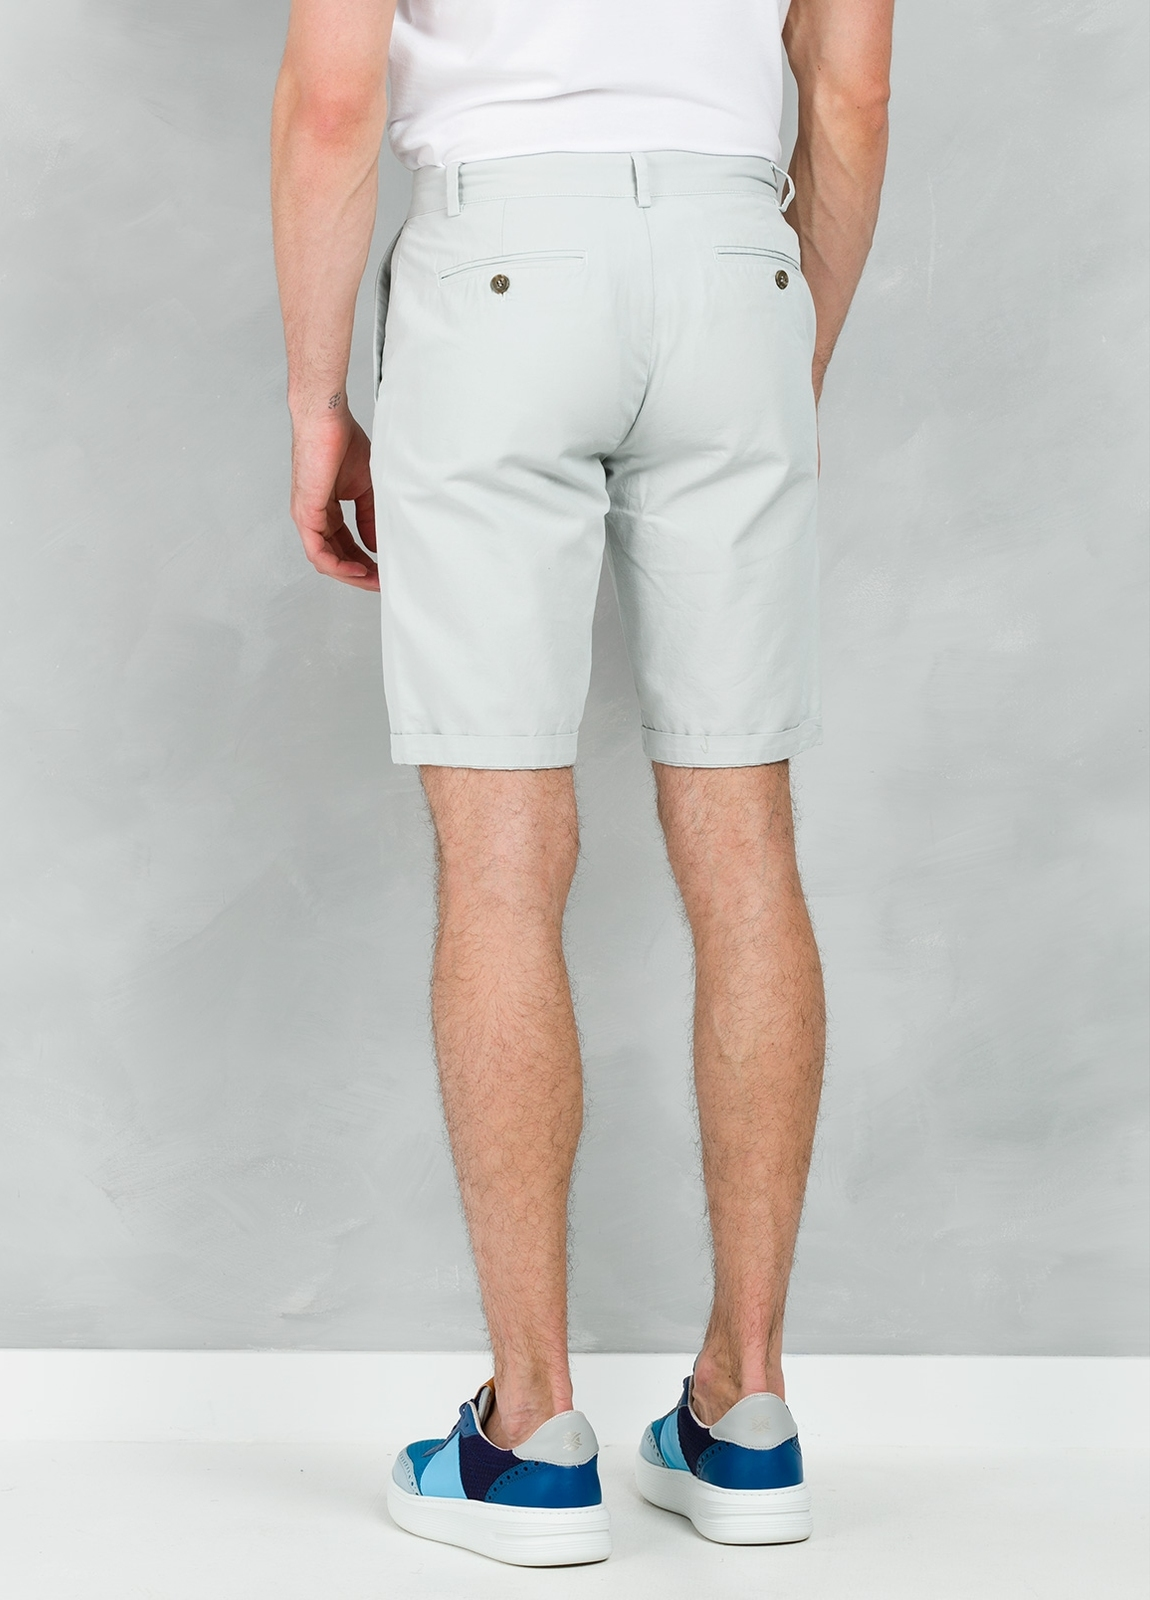 Short Furest Casual Wear color gris perla , 100% Algodón. - Ítem2